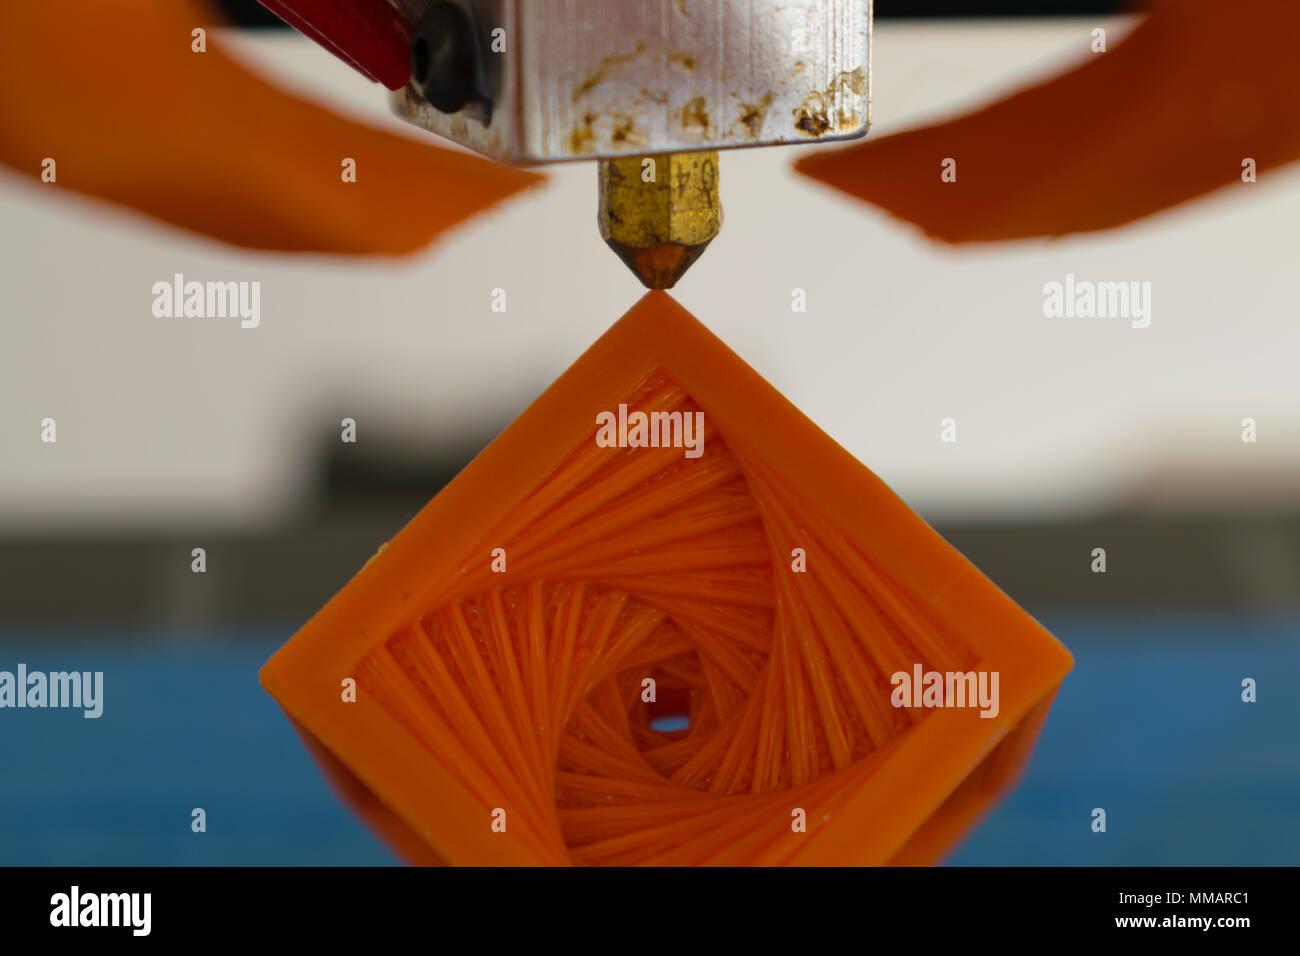 3d-Drucker Heiß-Düse mit gedruckten Objekt Konzept Stockbild